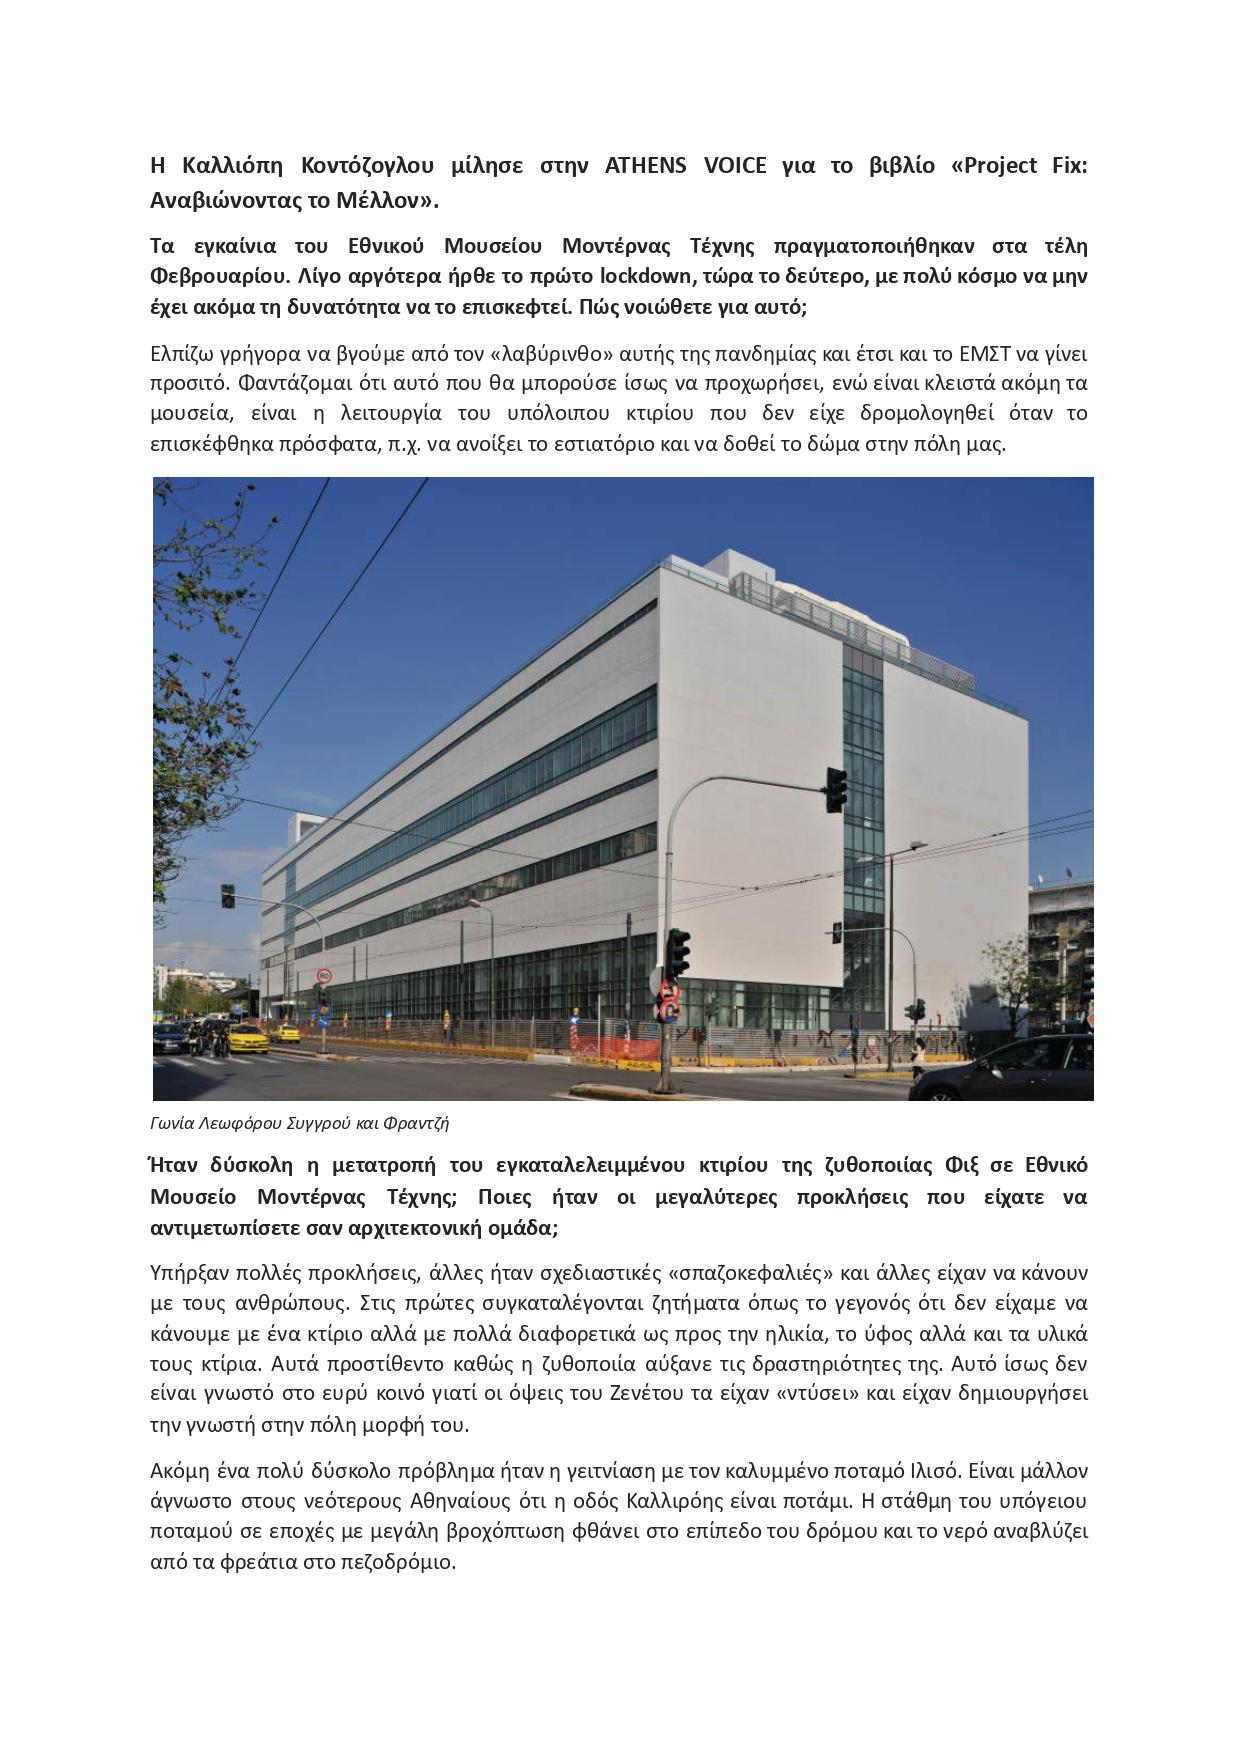 AthensVoice Kalliope Kontozoglou.docx - Google Docs_page-0002